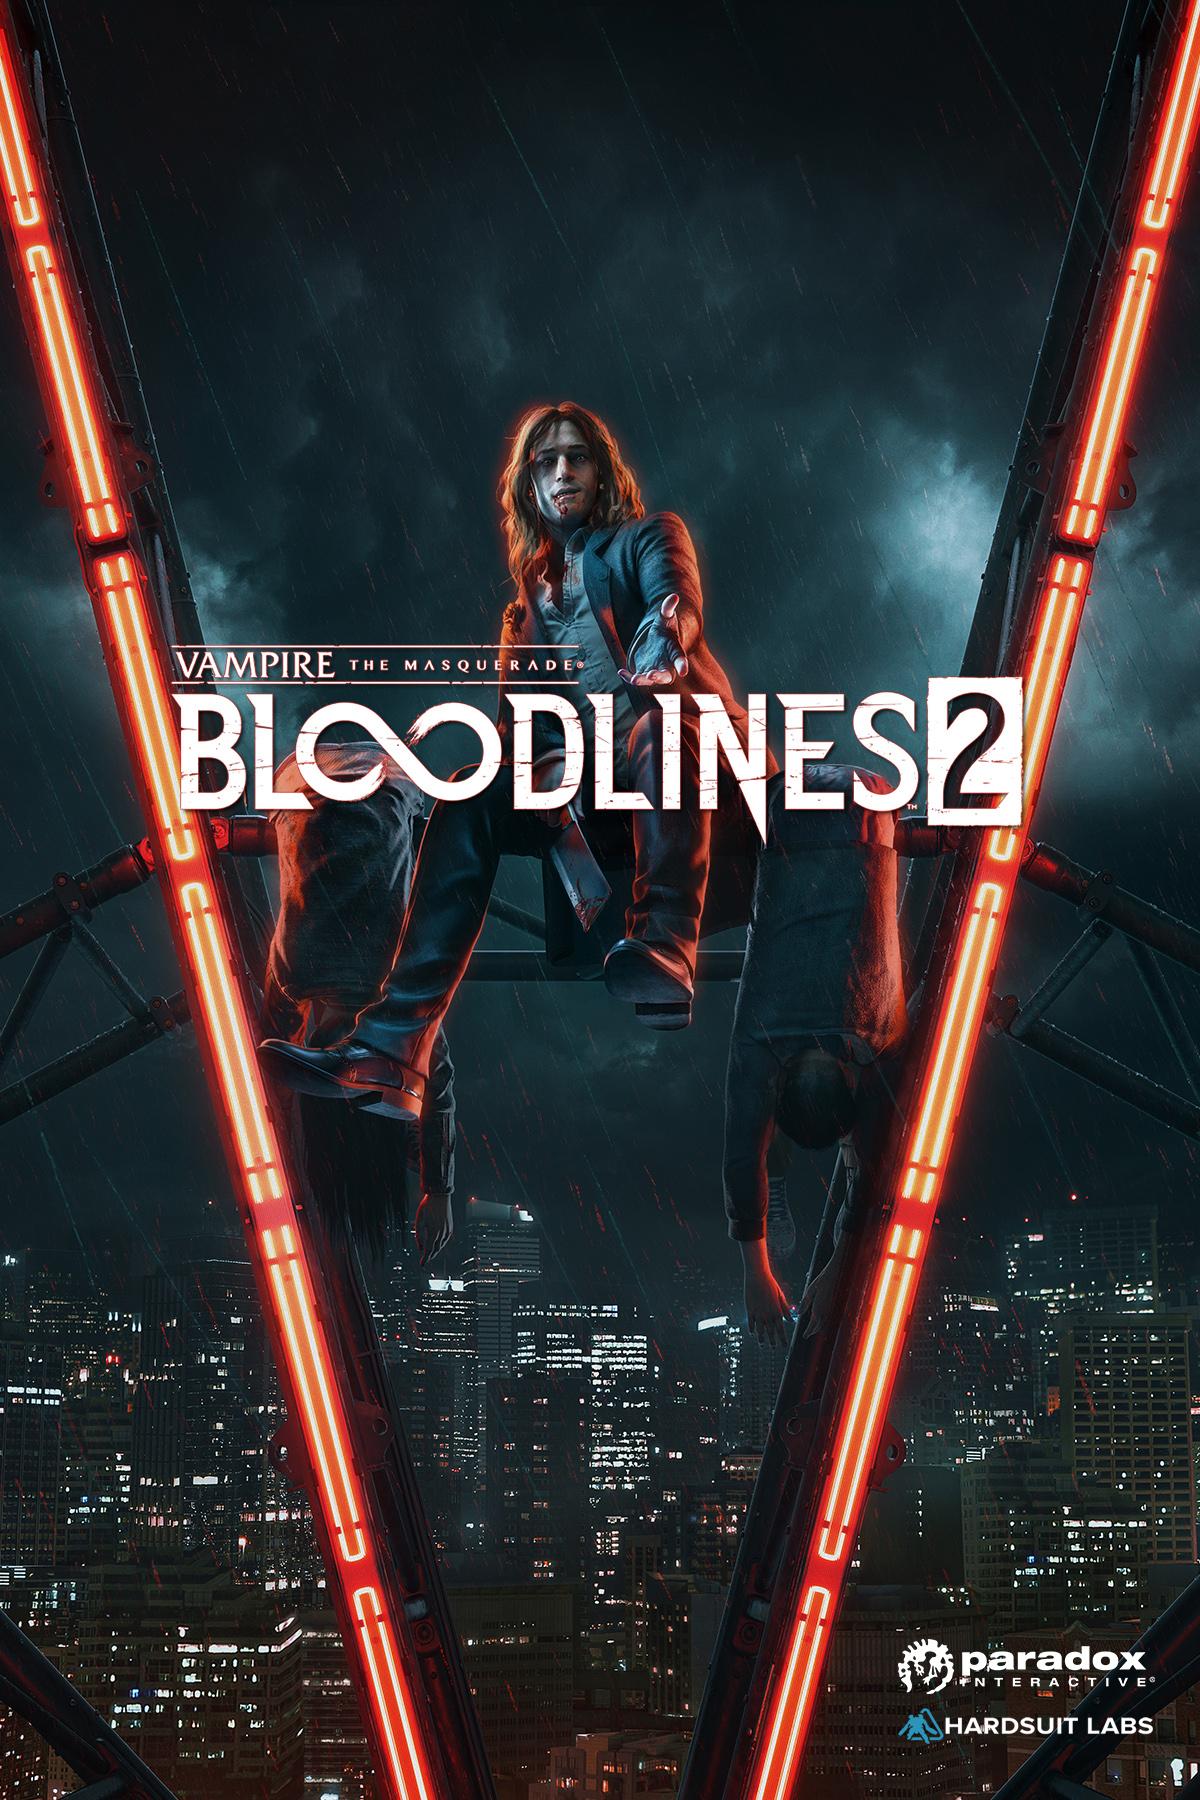 Vampire The Masquerade Bloodlines 2 Video Game 2020 Imdb